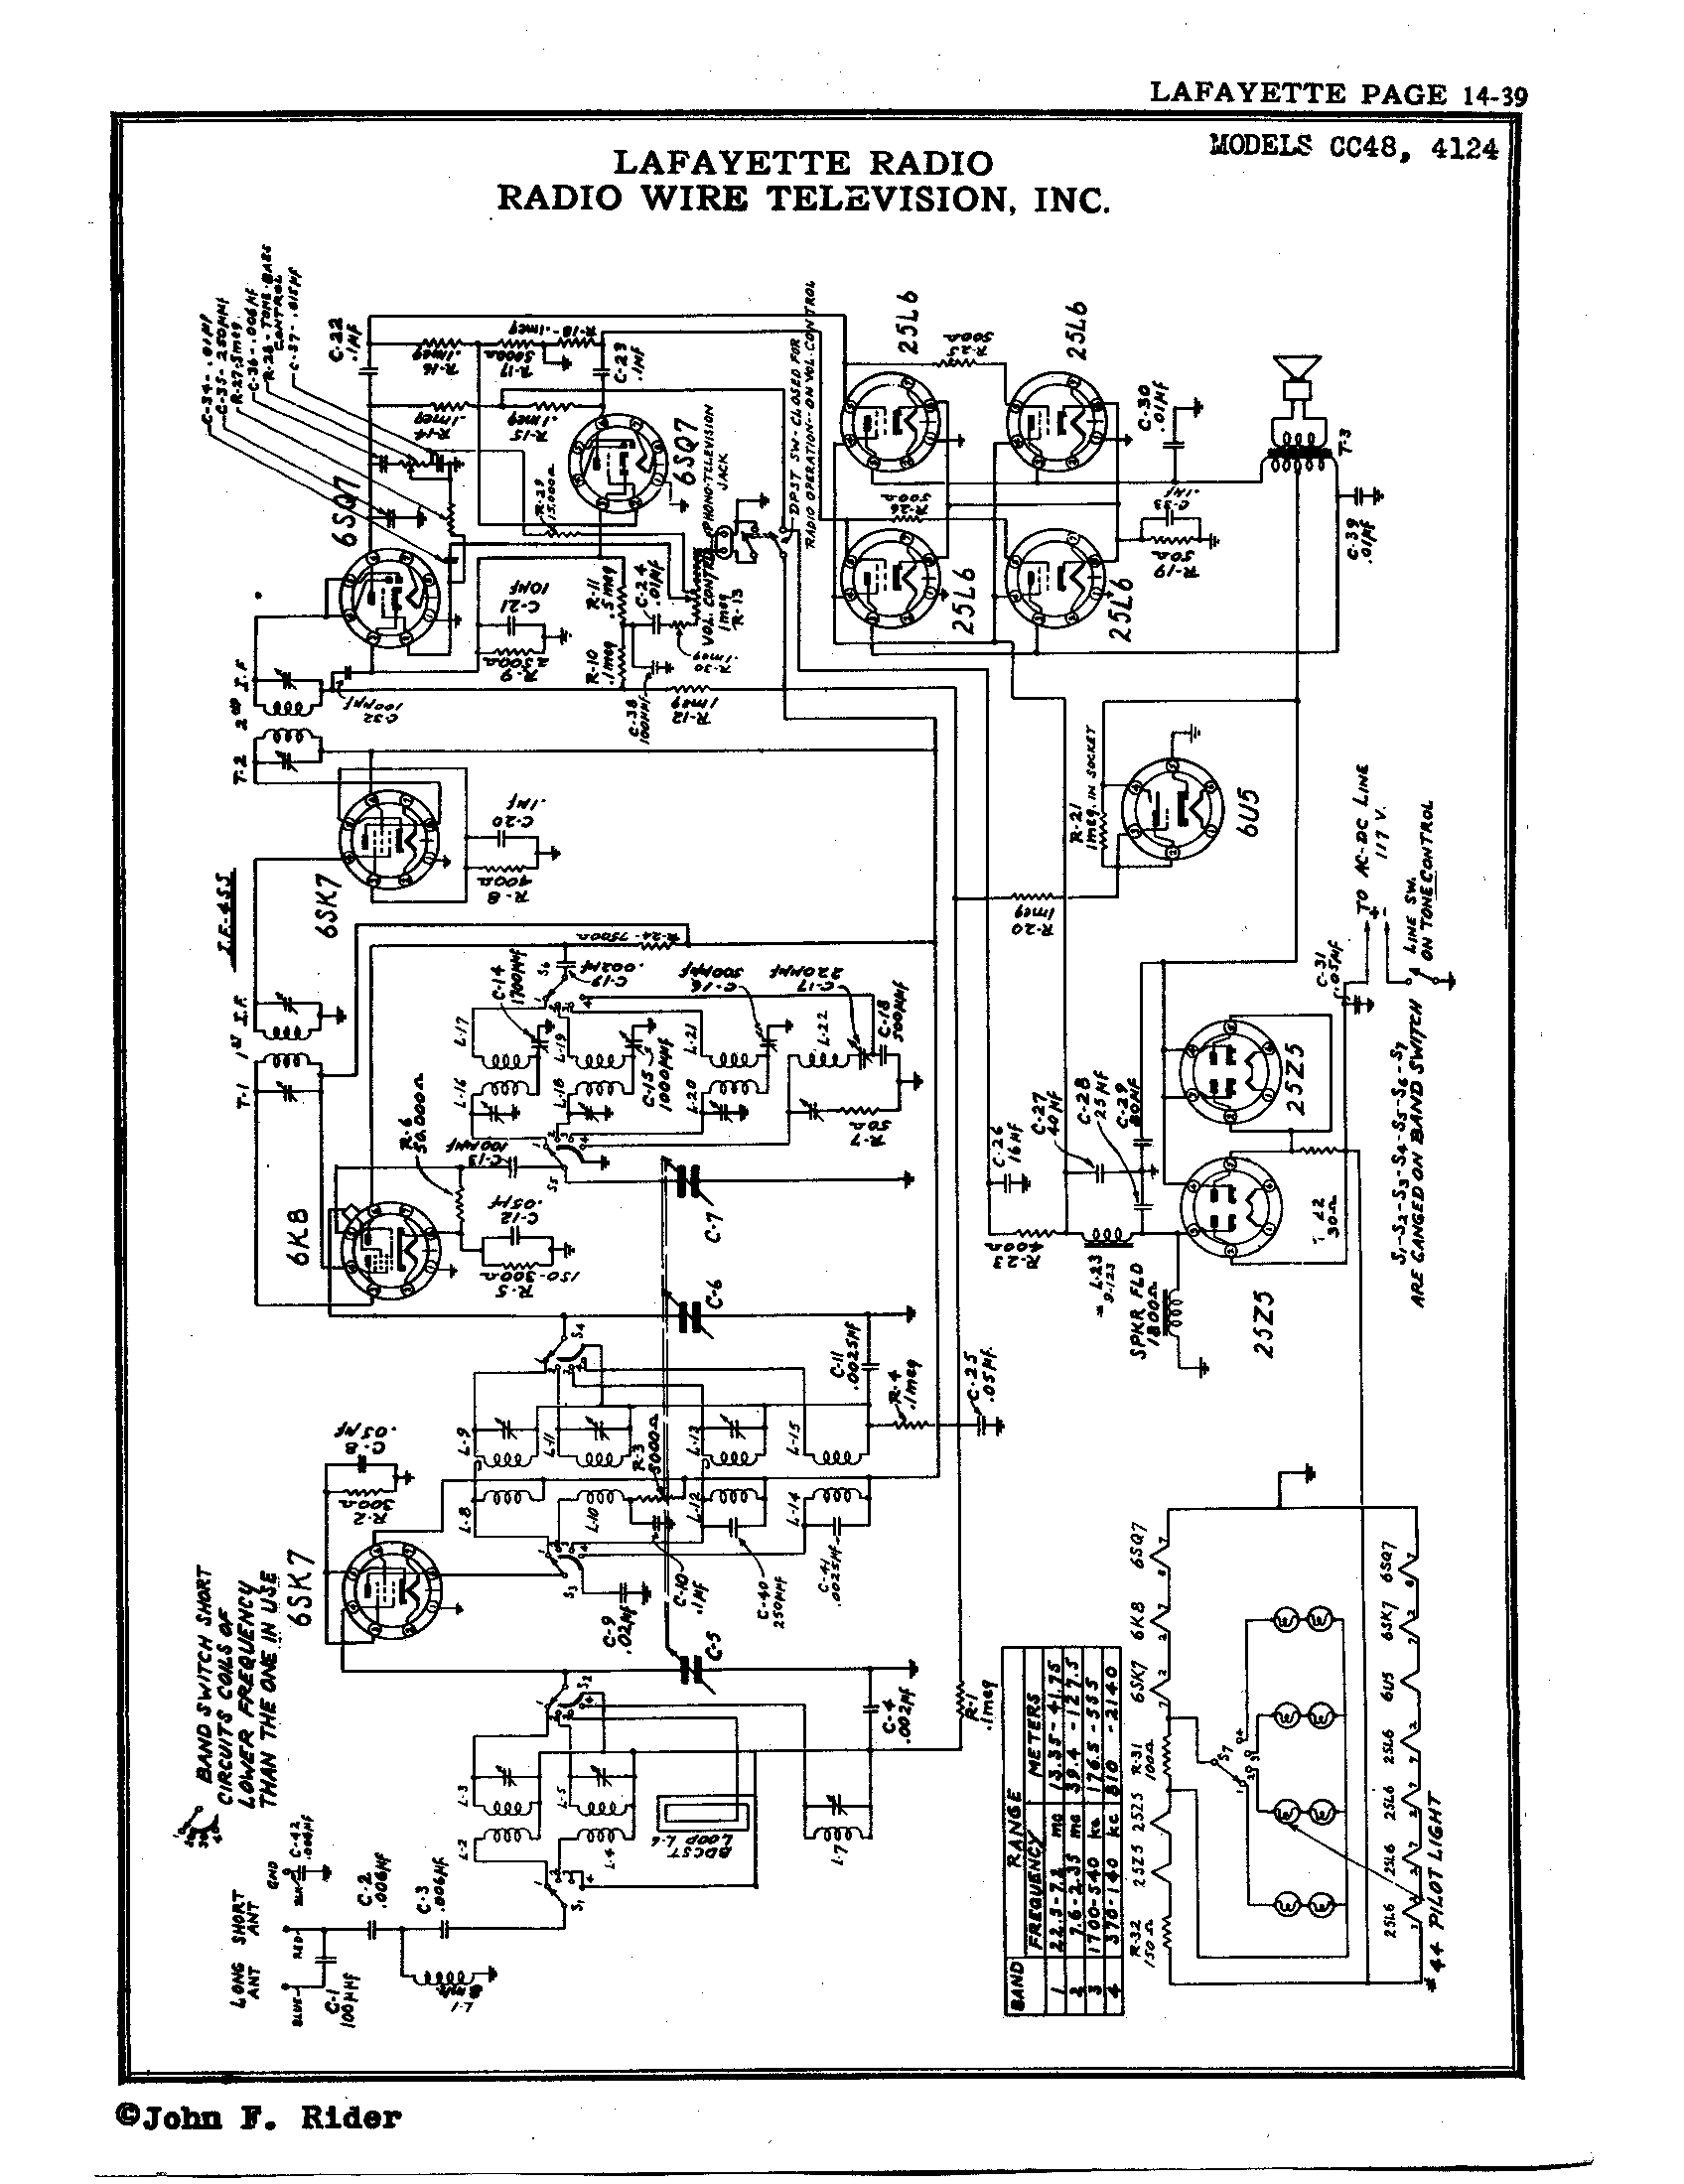 Groovy L520 Wiring Diagram Wiring Diagram Wiring Digital Resources Dylitashwinbiharinl